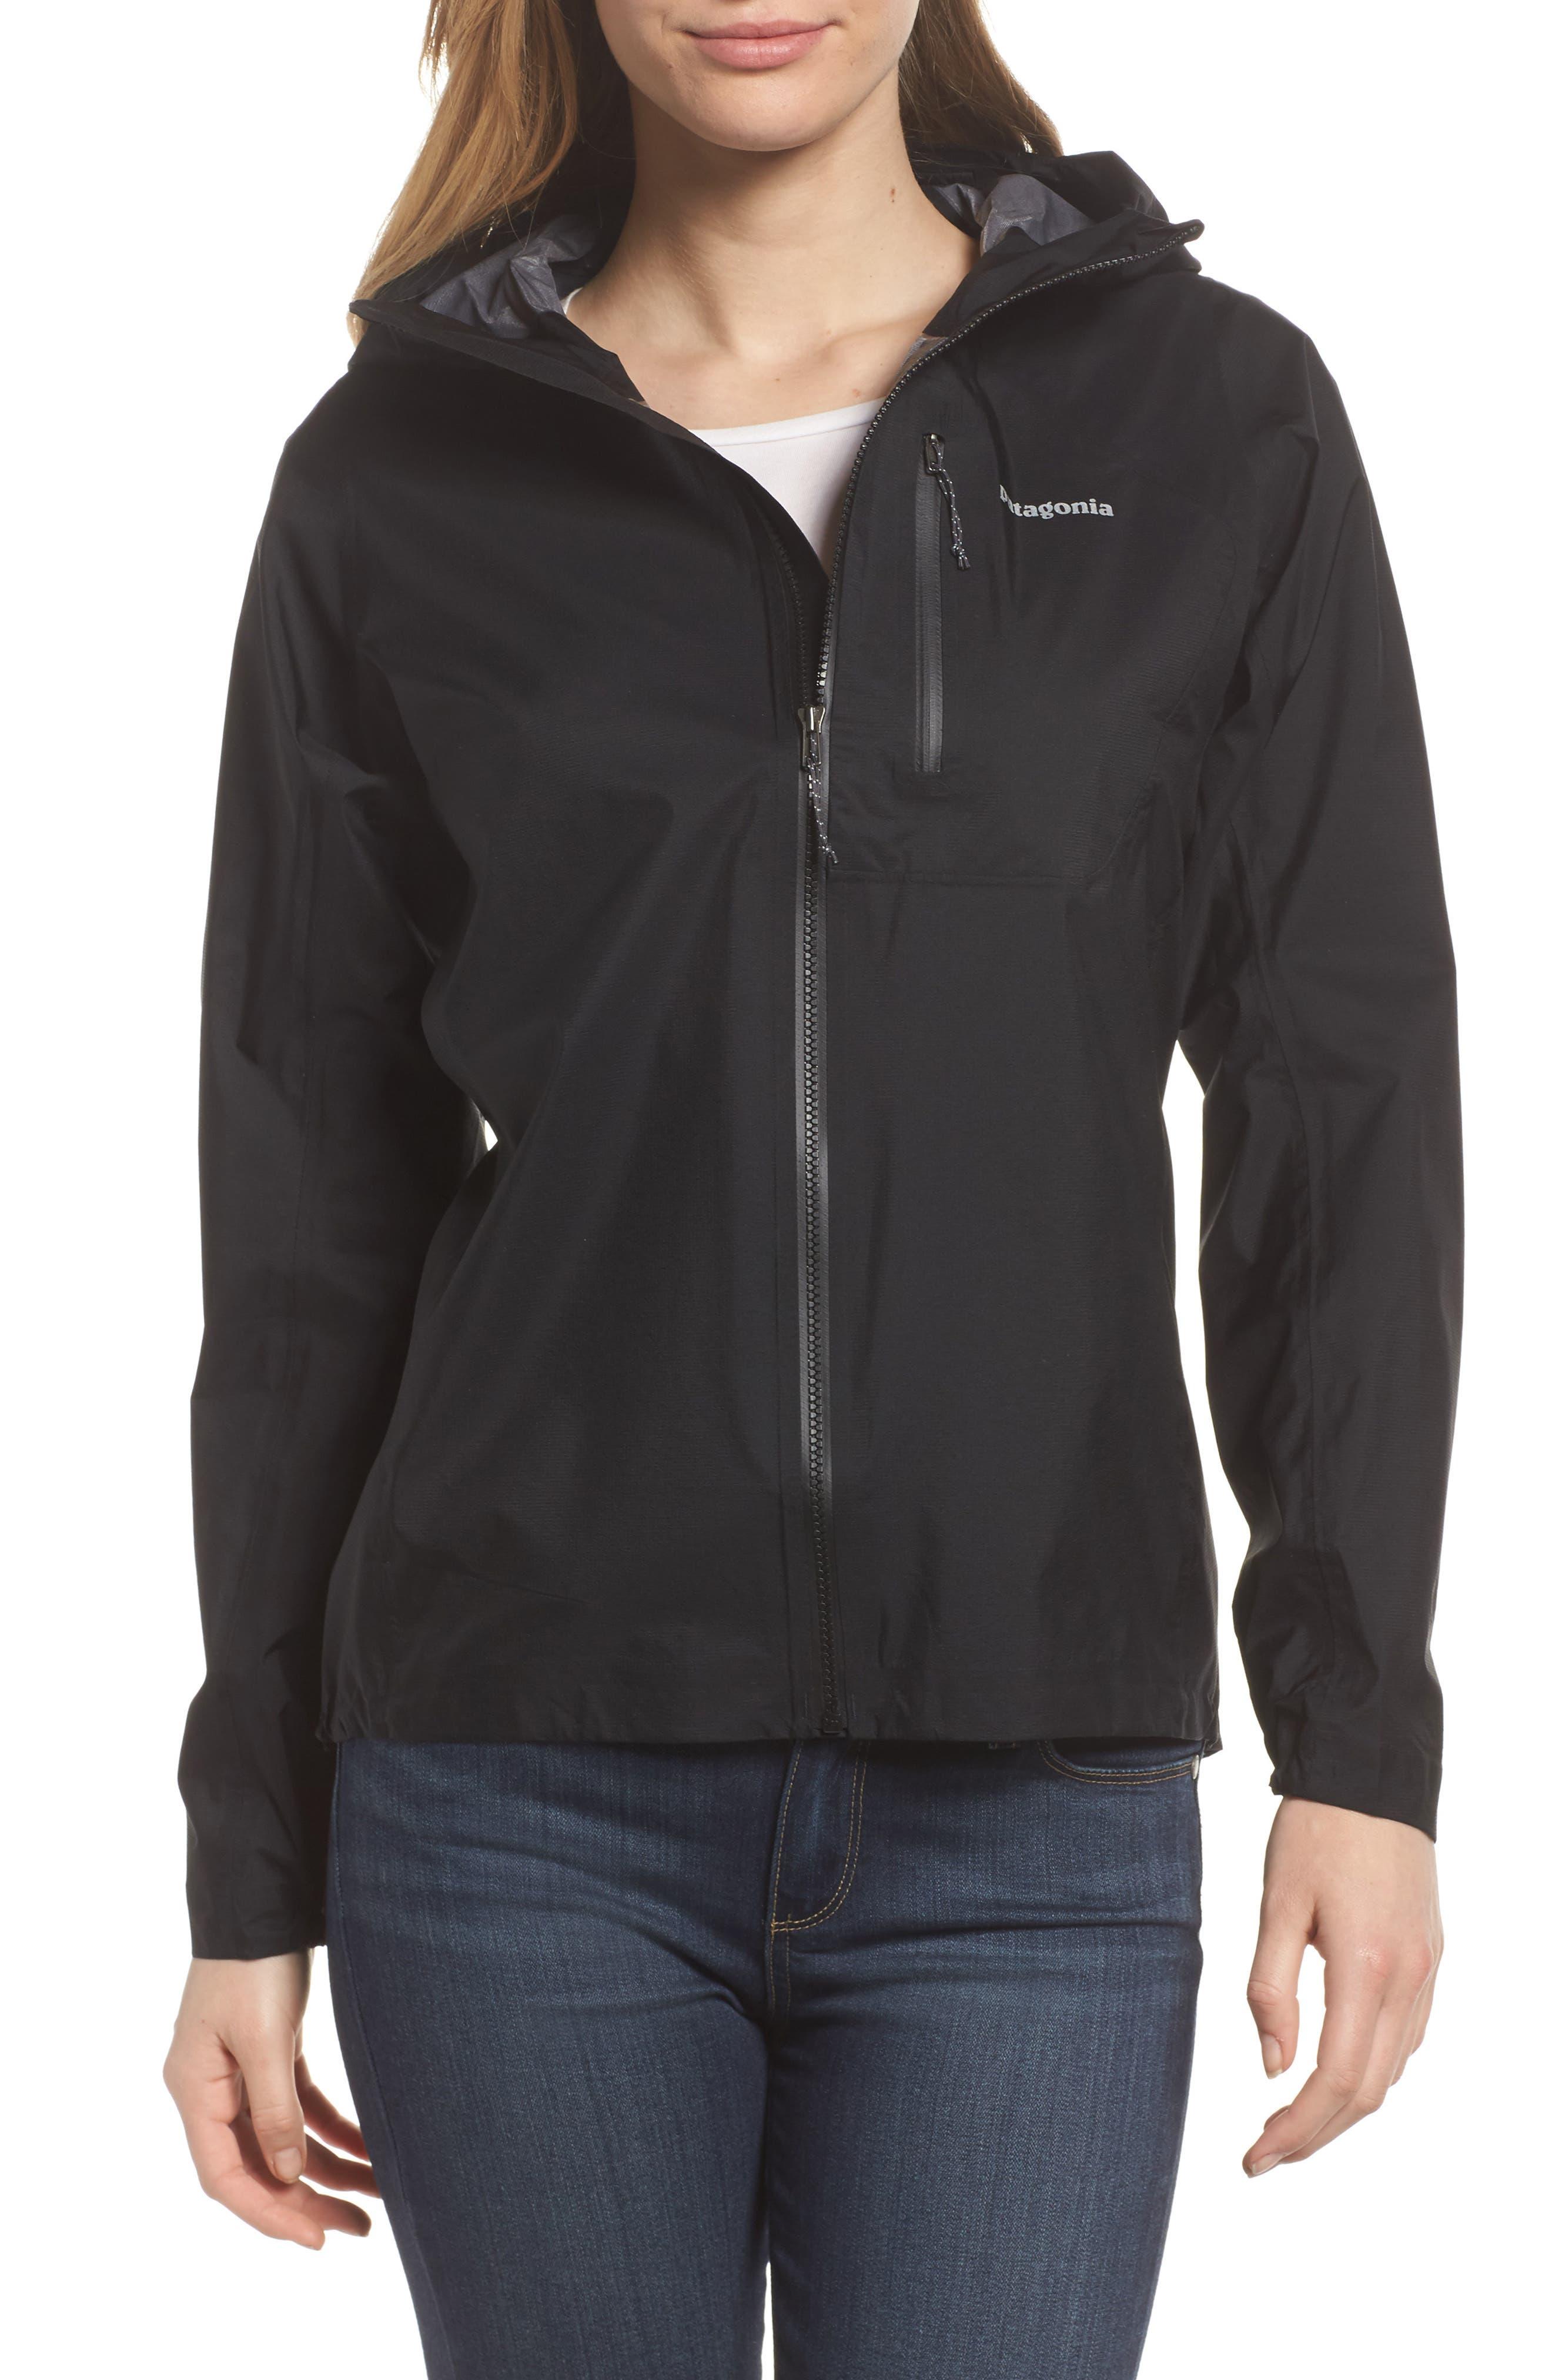 Storm Racer Jacket,                             Main thumbnail 1, color,                             BLACK